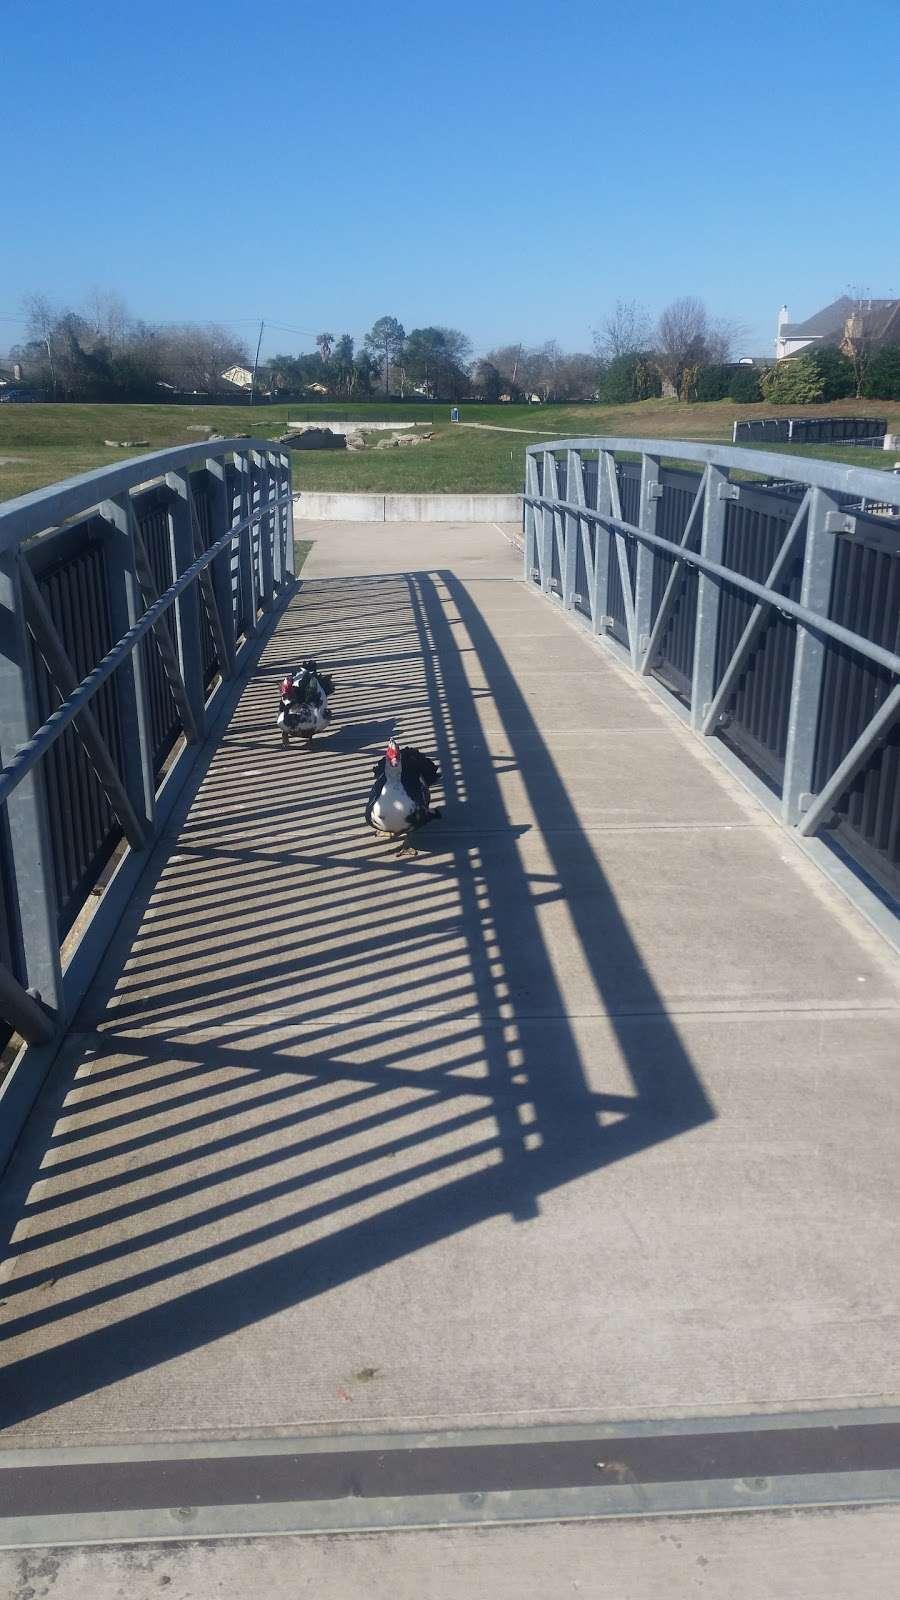 Heritage Park Overlook Basin - park  | Photo 9 of 10 | Address: Friendswood Link Rd, Friendswood, TX 77546, USA